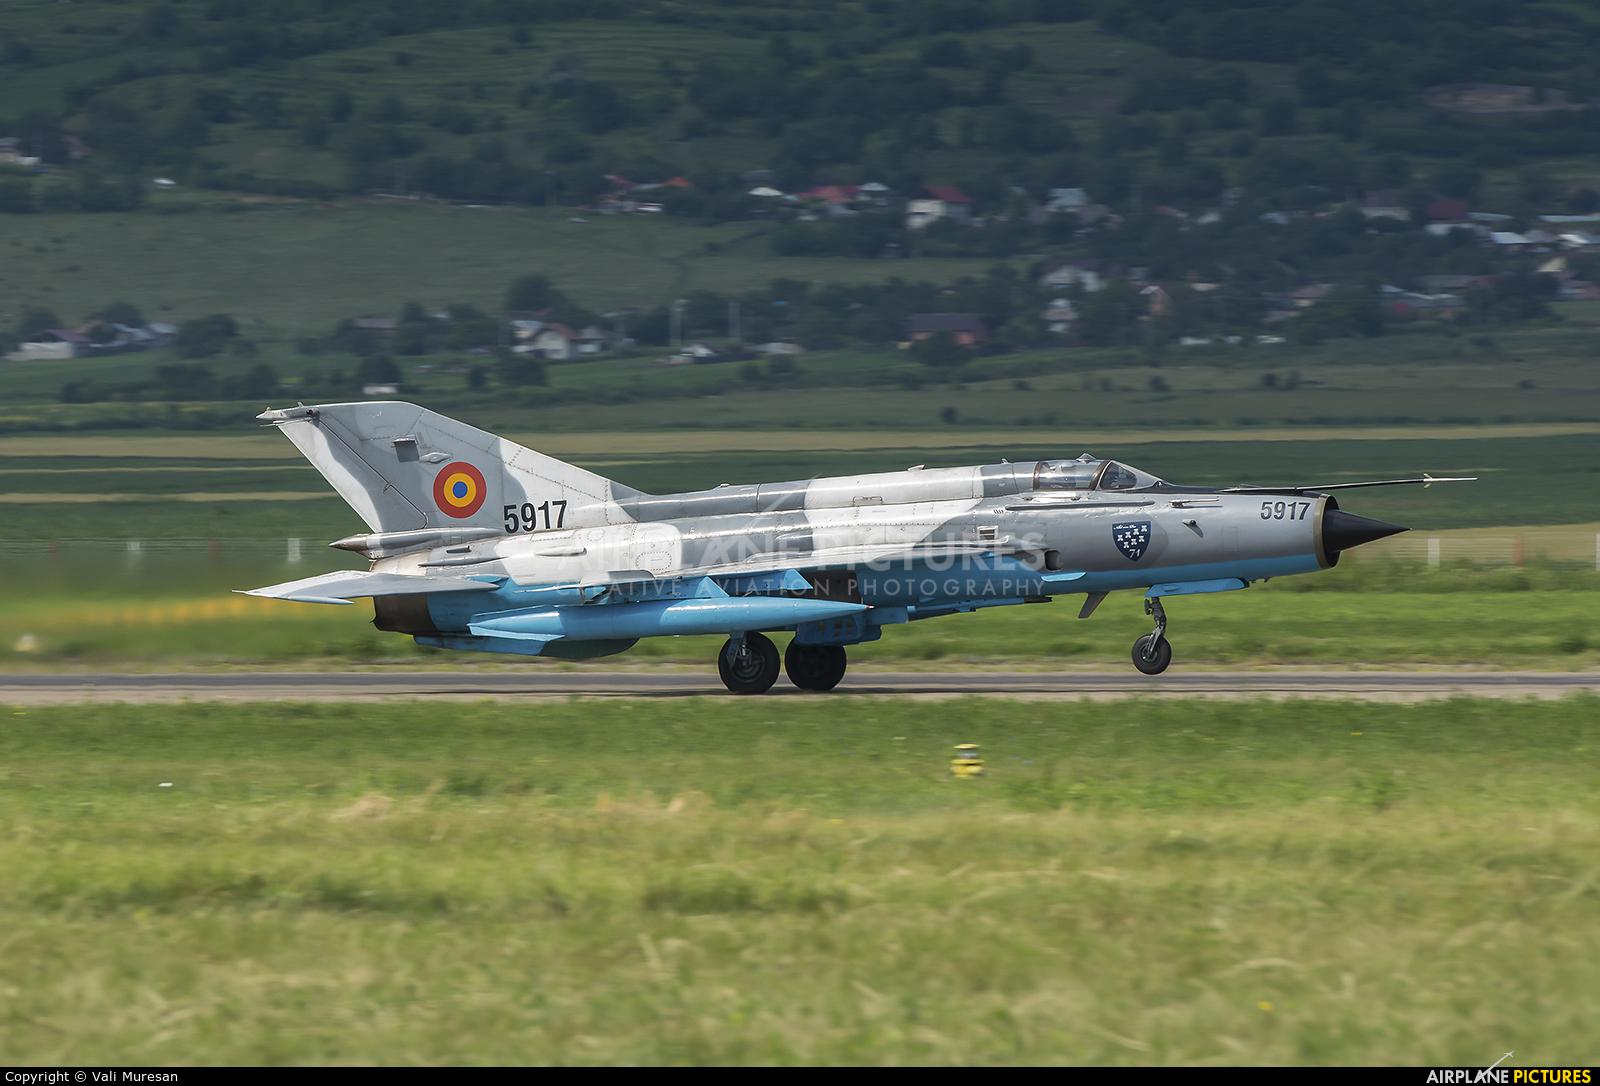 Romania - Air Force 5917 aircraft at Bacau